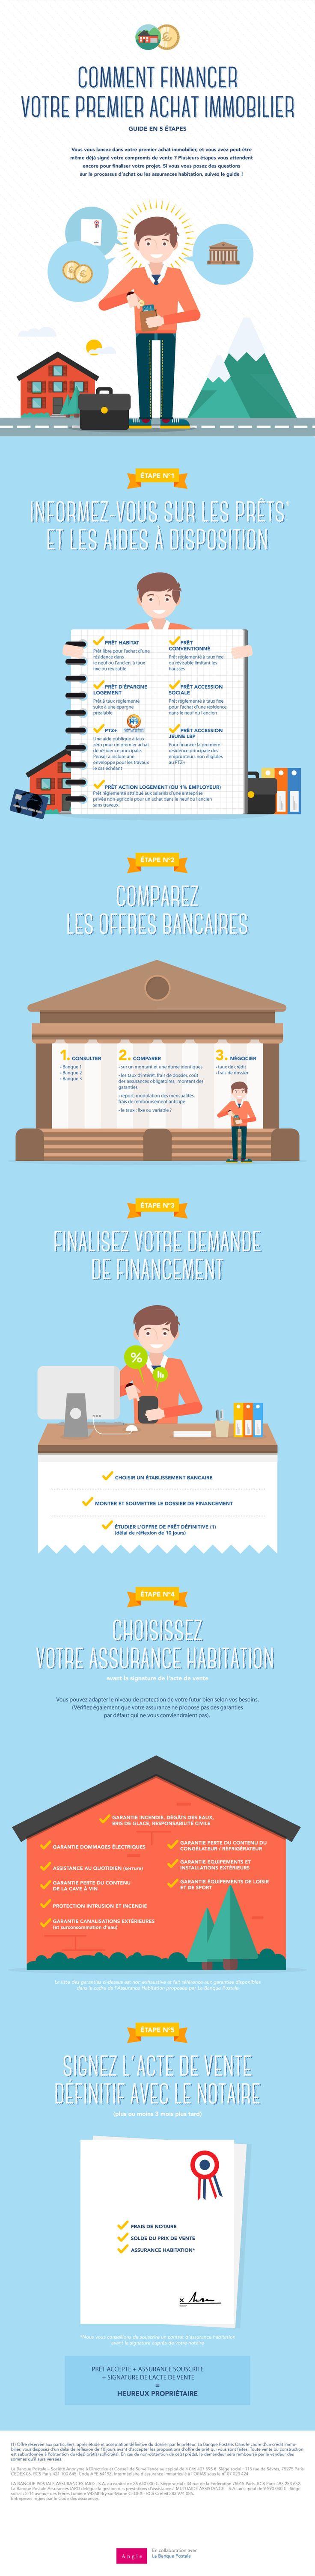 Credit Immo – La Banque Postale